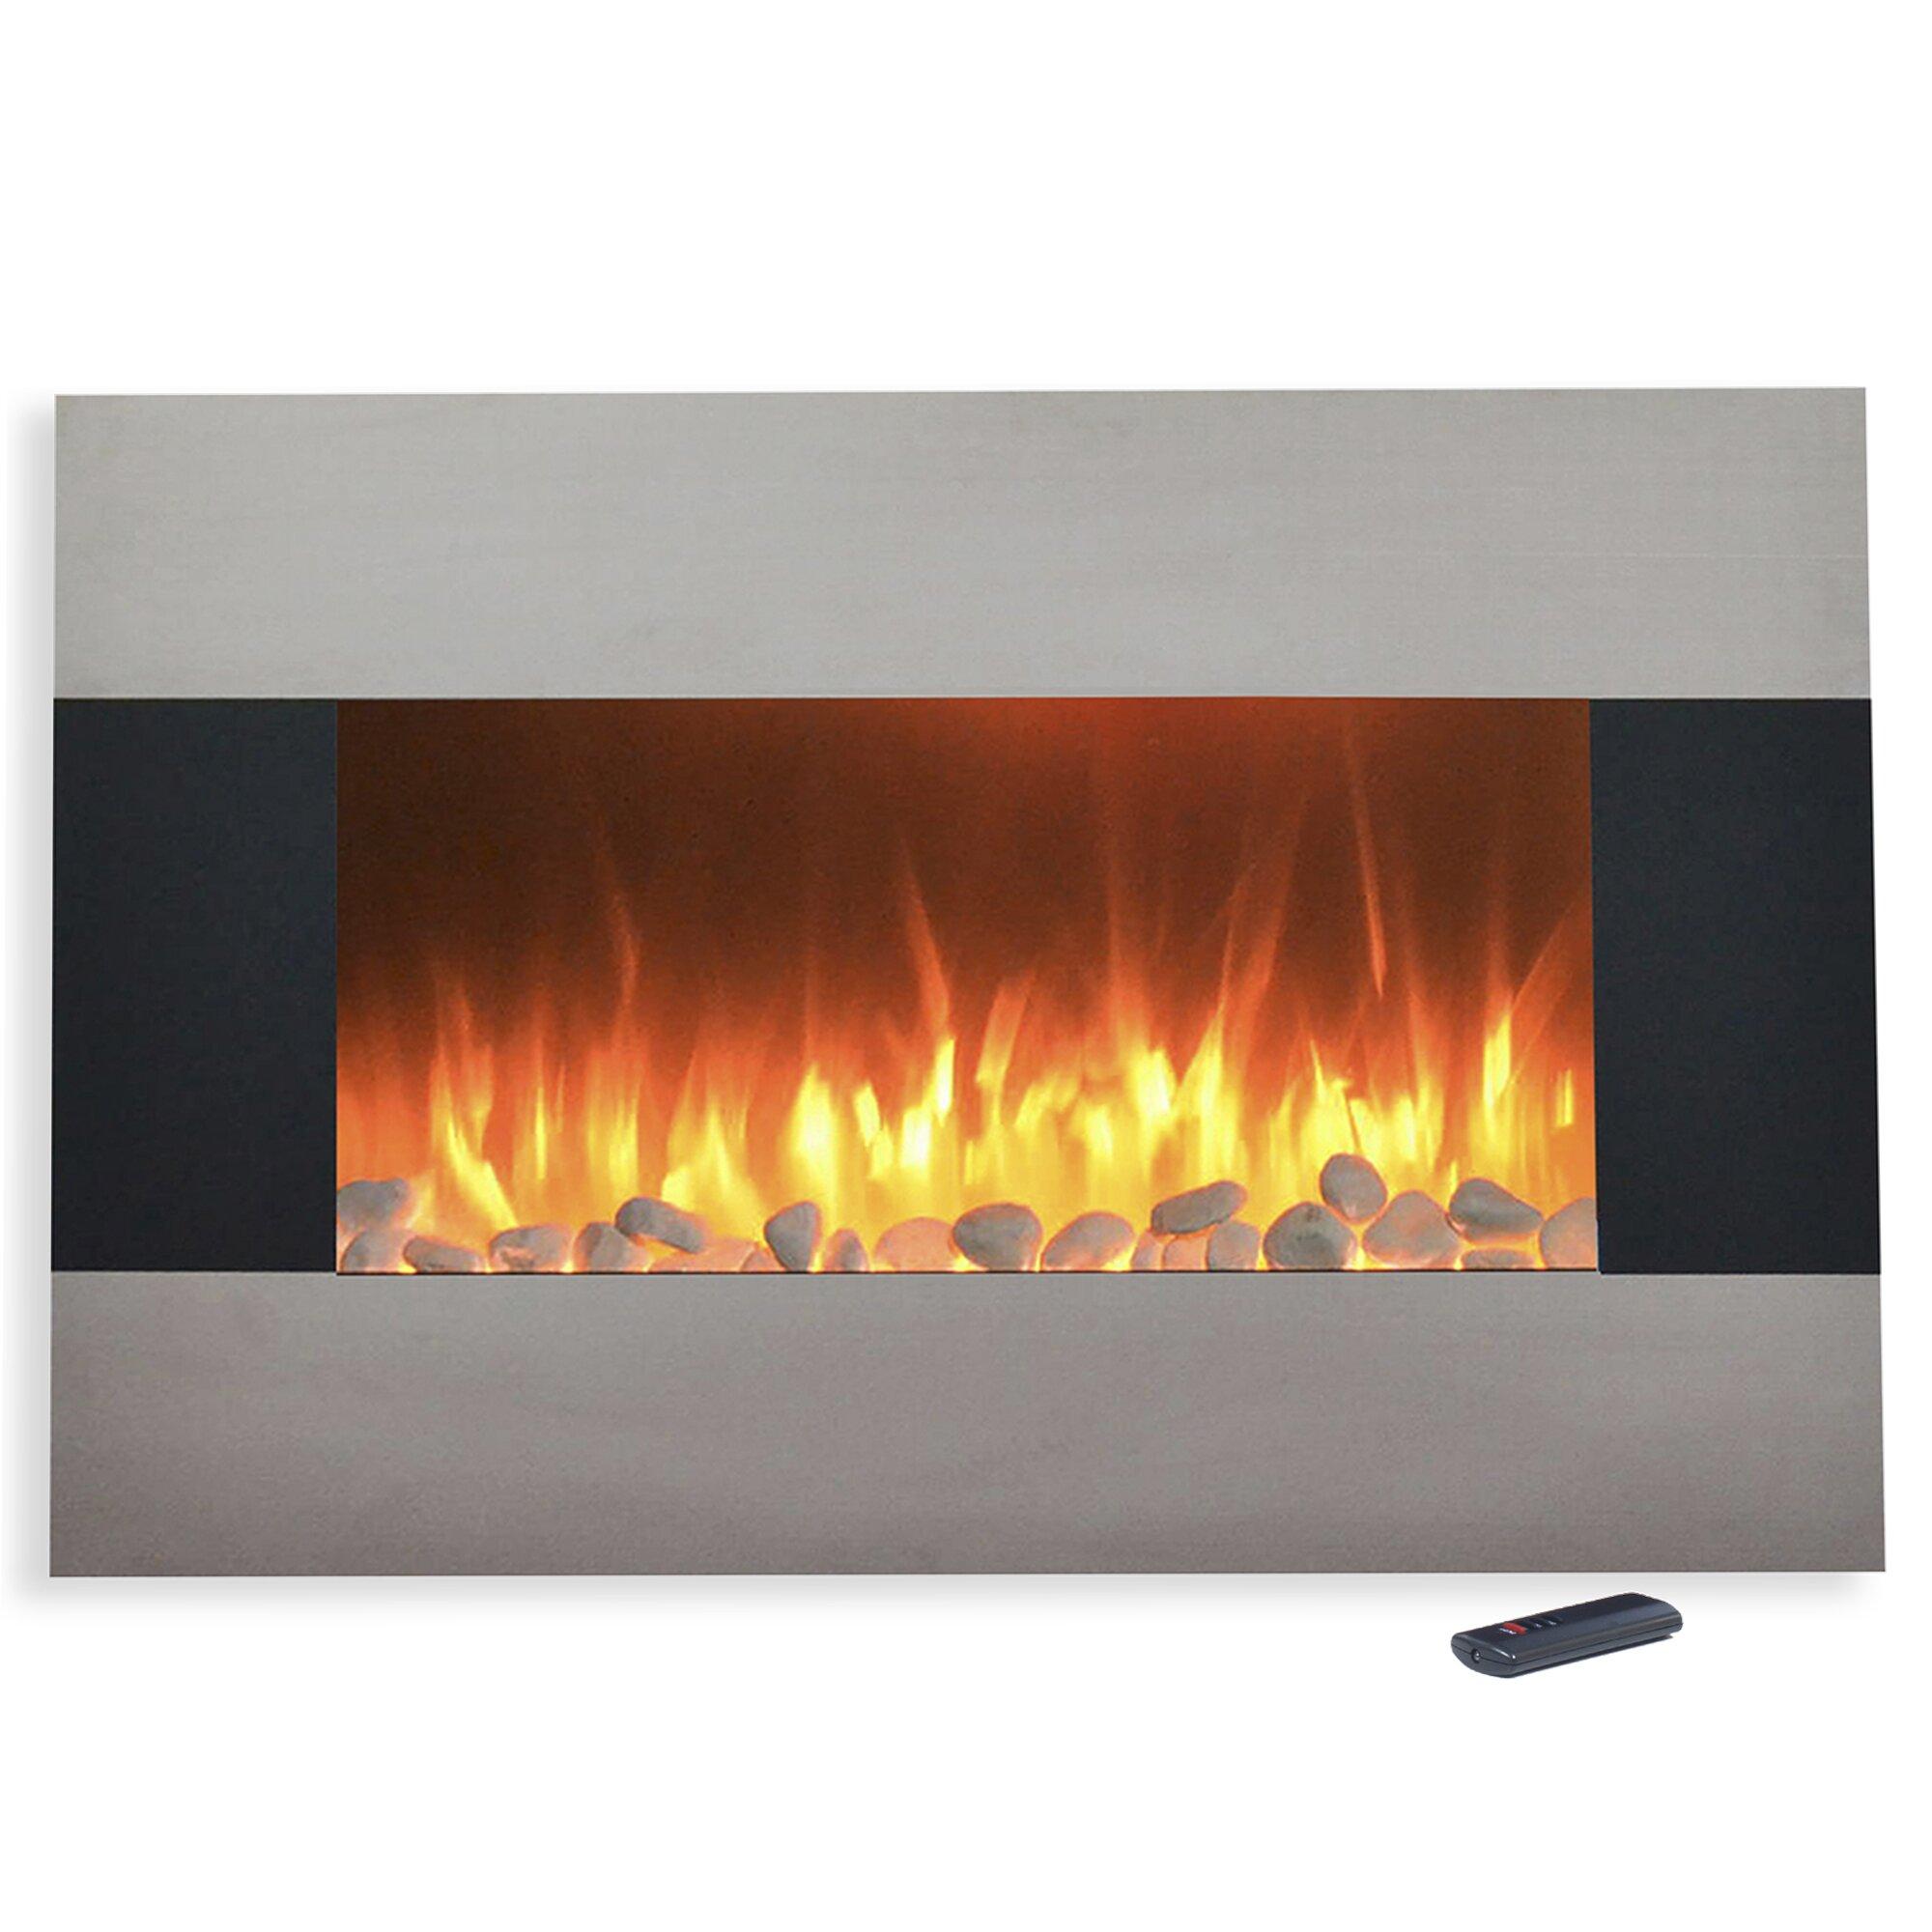 Northwest Steel Wall Mount Electric Fireplace Reviews Wayfair